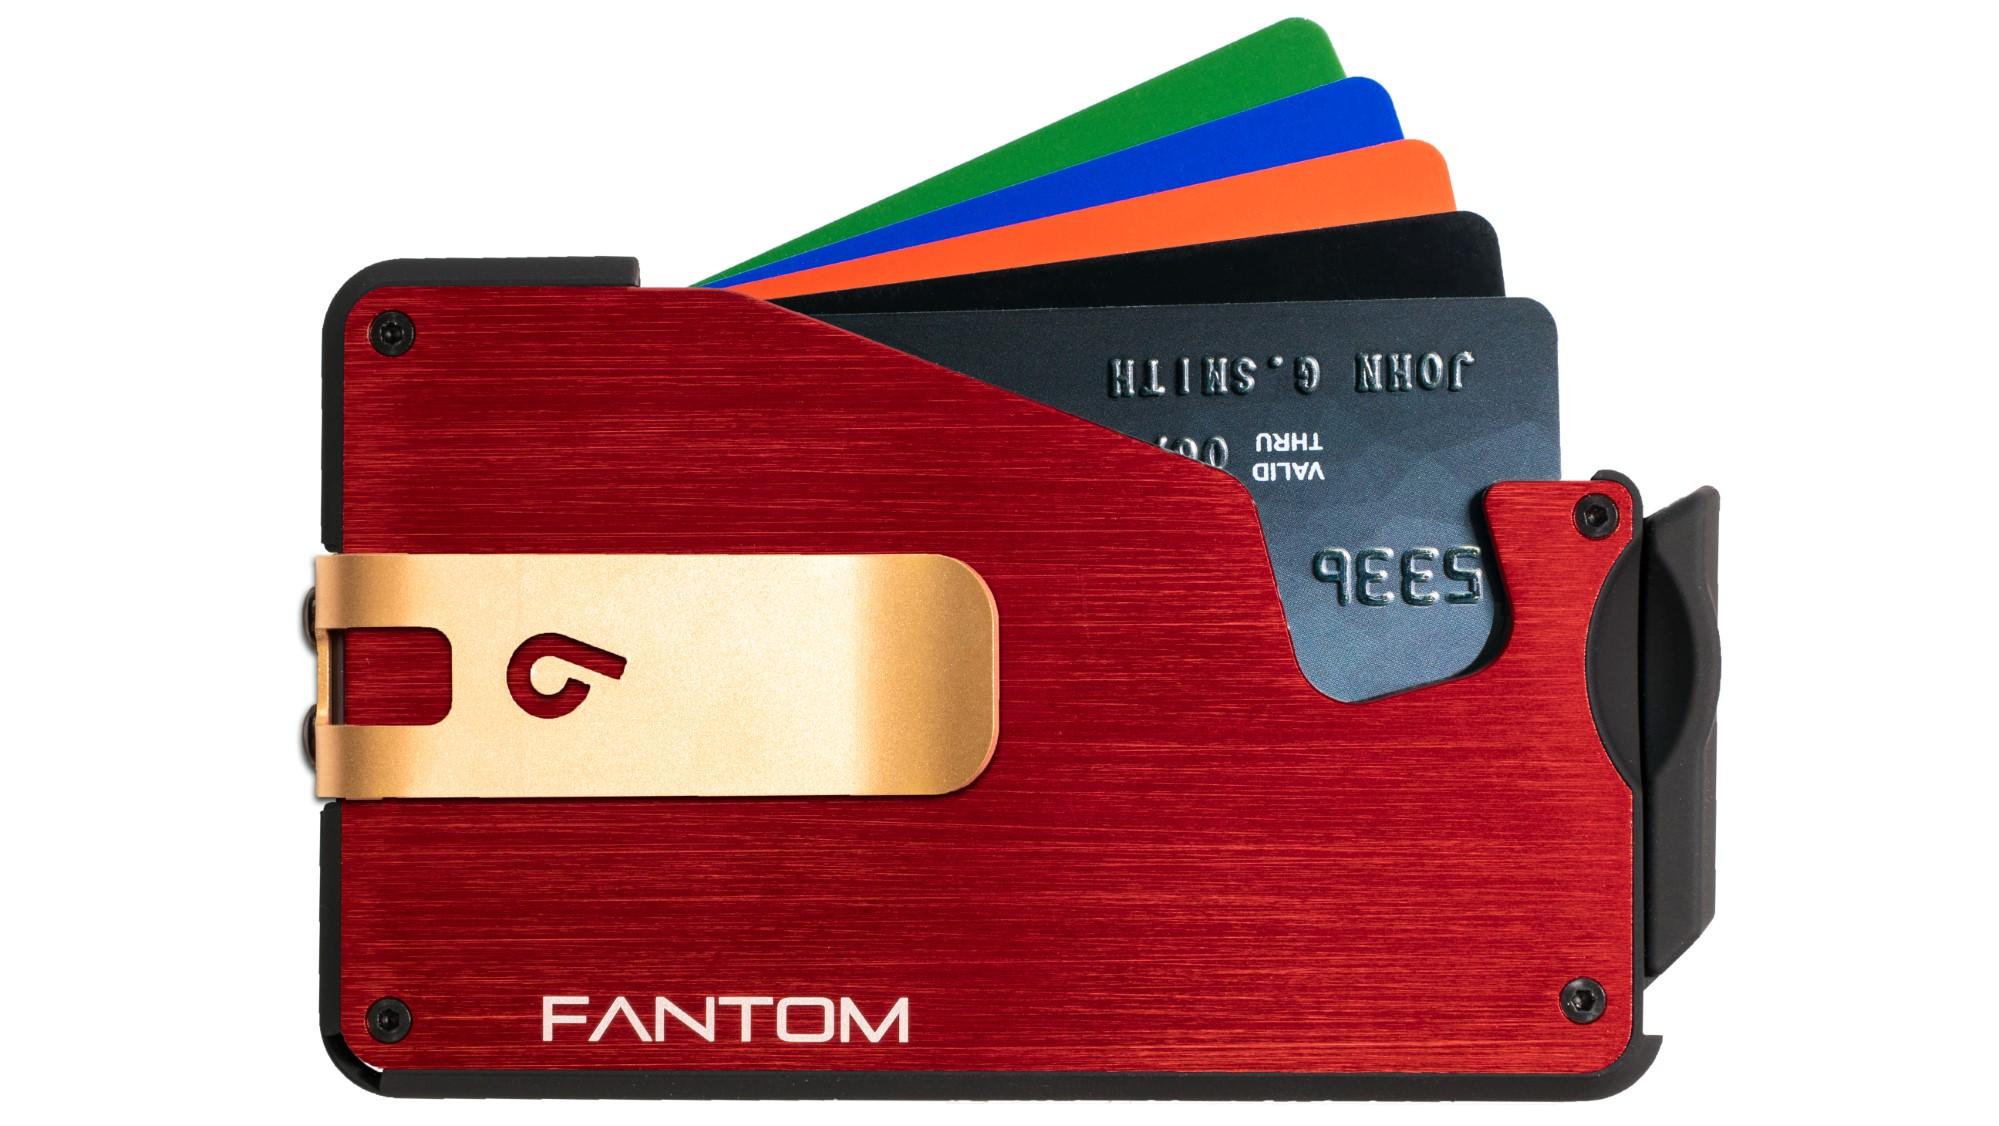 Fantom 10 Red Regular Version with Gold Money Clip